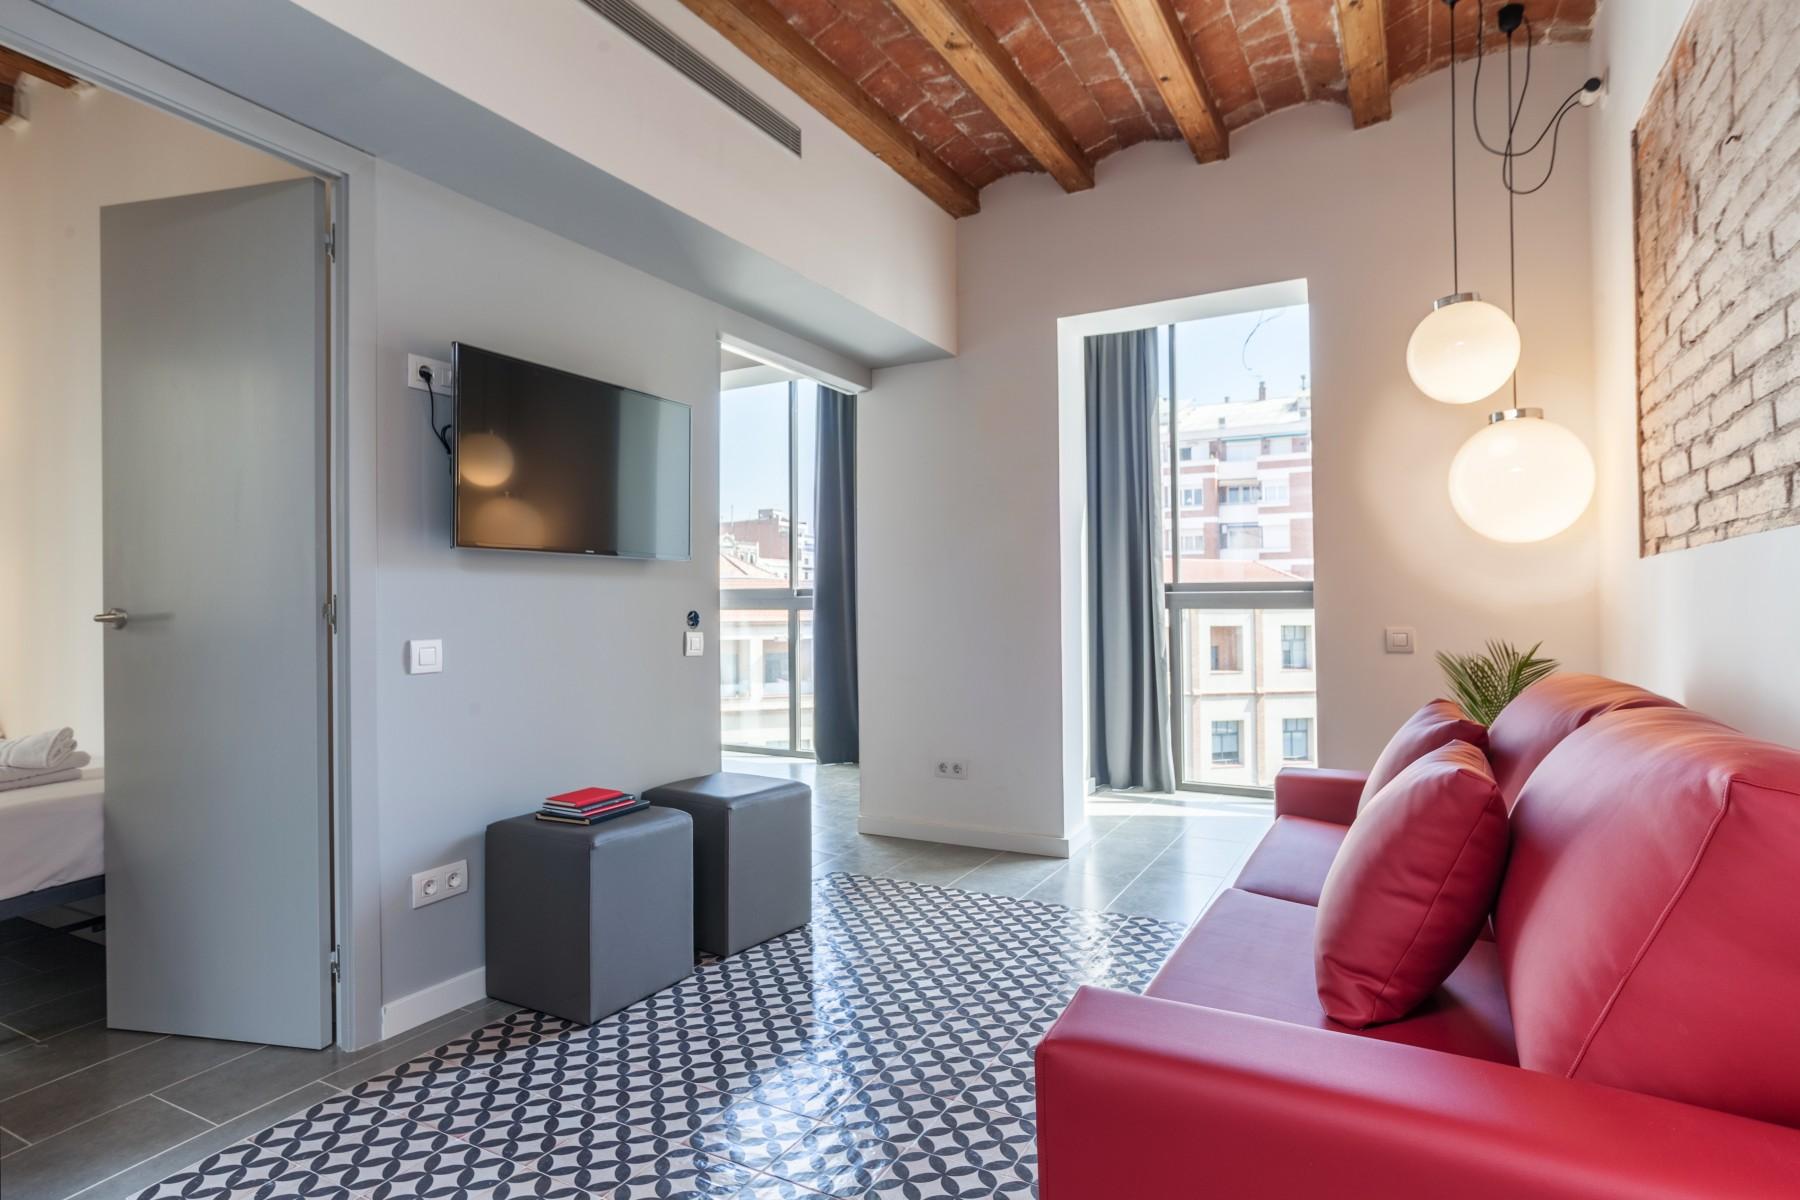 Piso moderno con terraza y piscina compartidos en eixample for Para desarrollar su apartamento con terraza